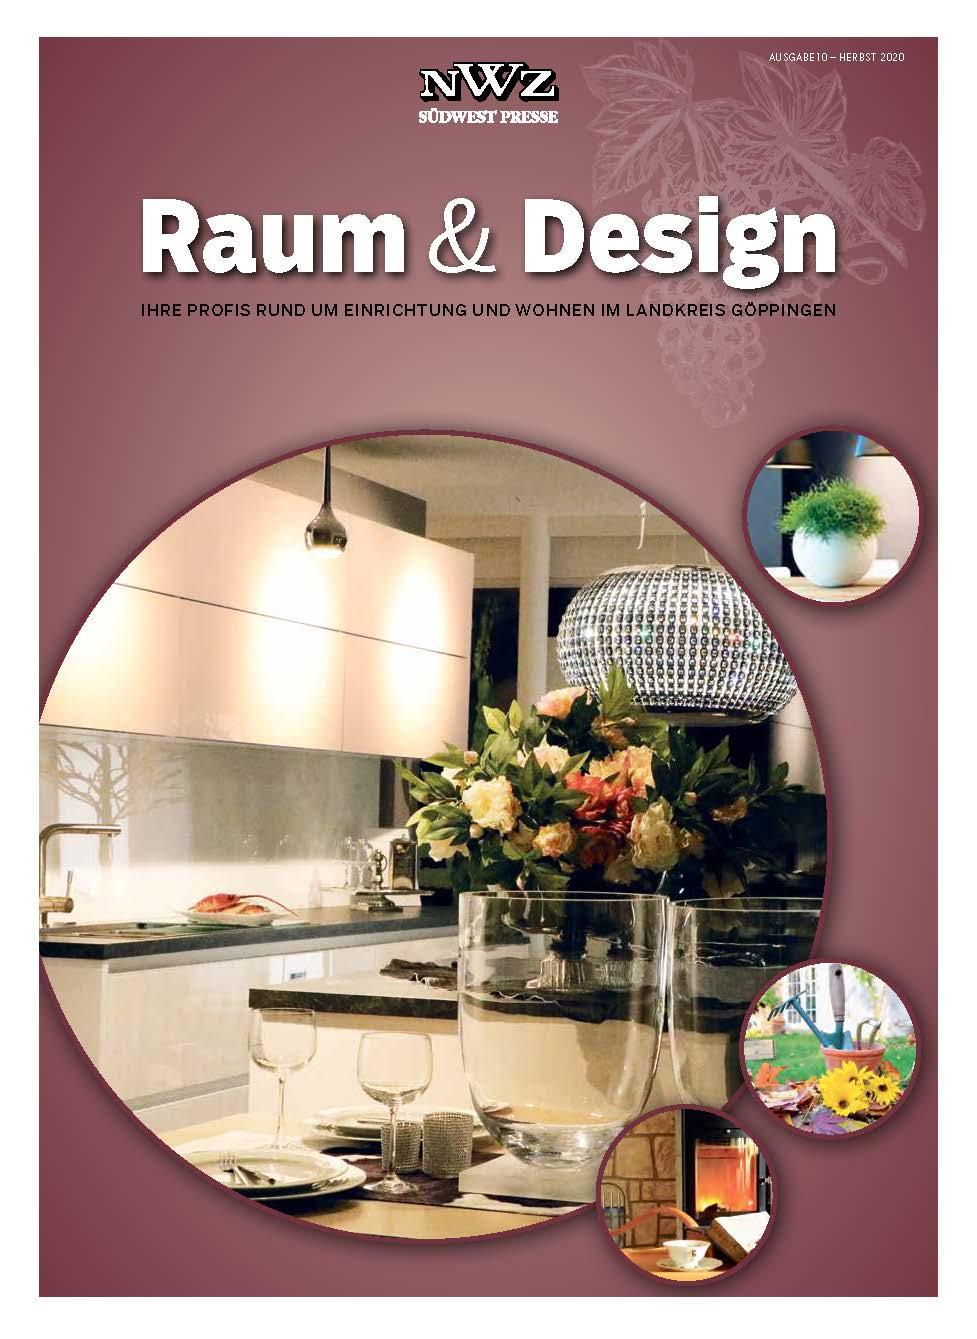 Rolladenbau Dähs Uhingen | Raum & Design